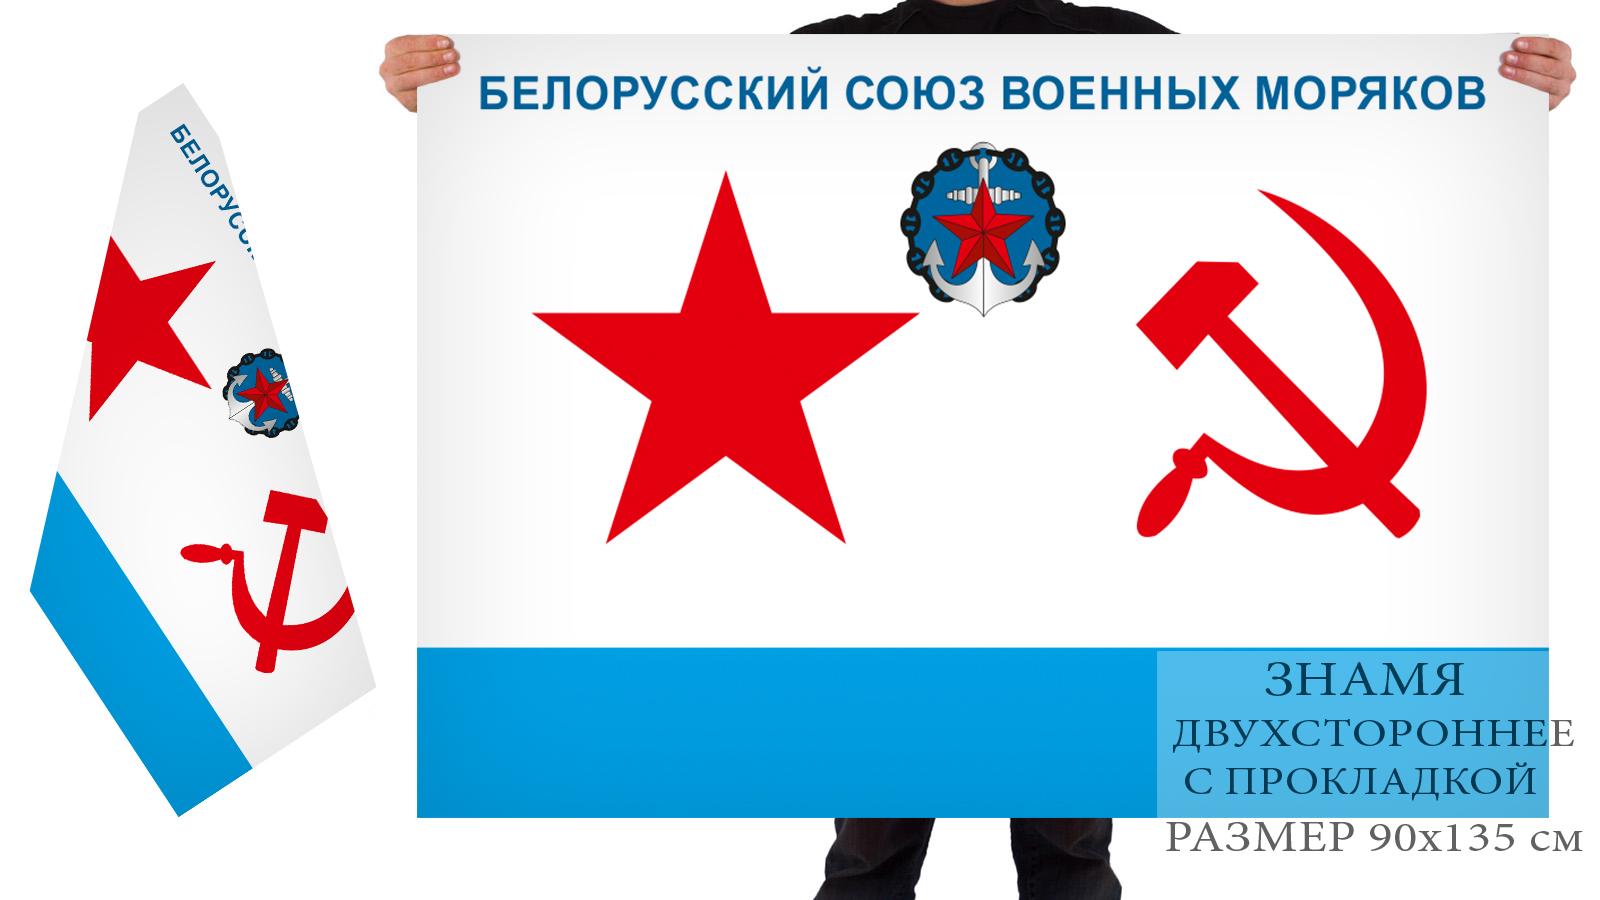 Двусторонний флаг Белорусского союза военных моряков